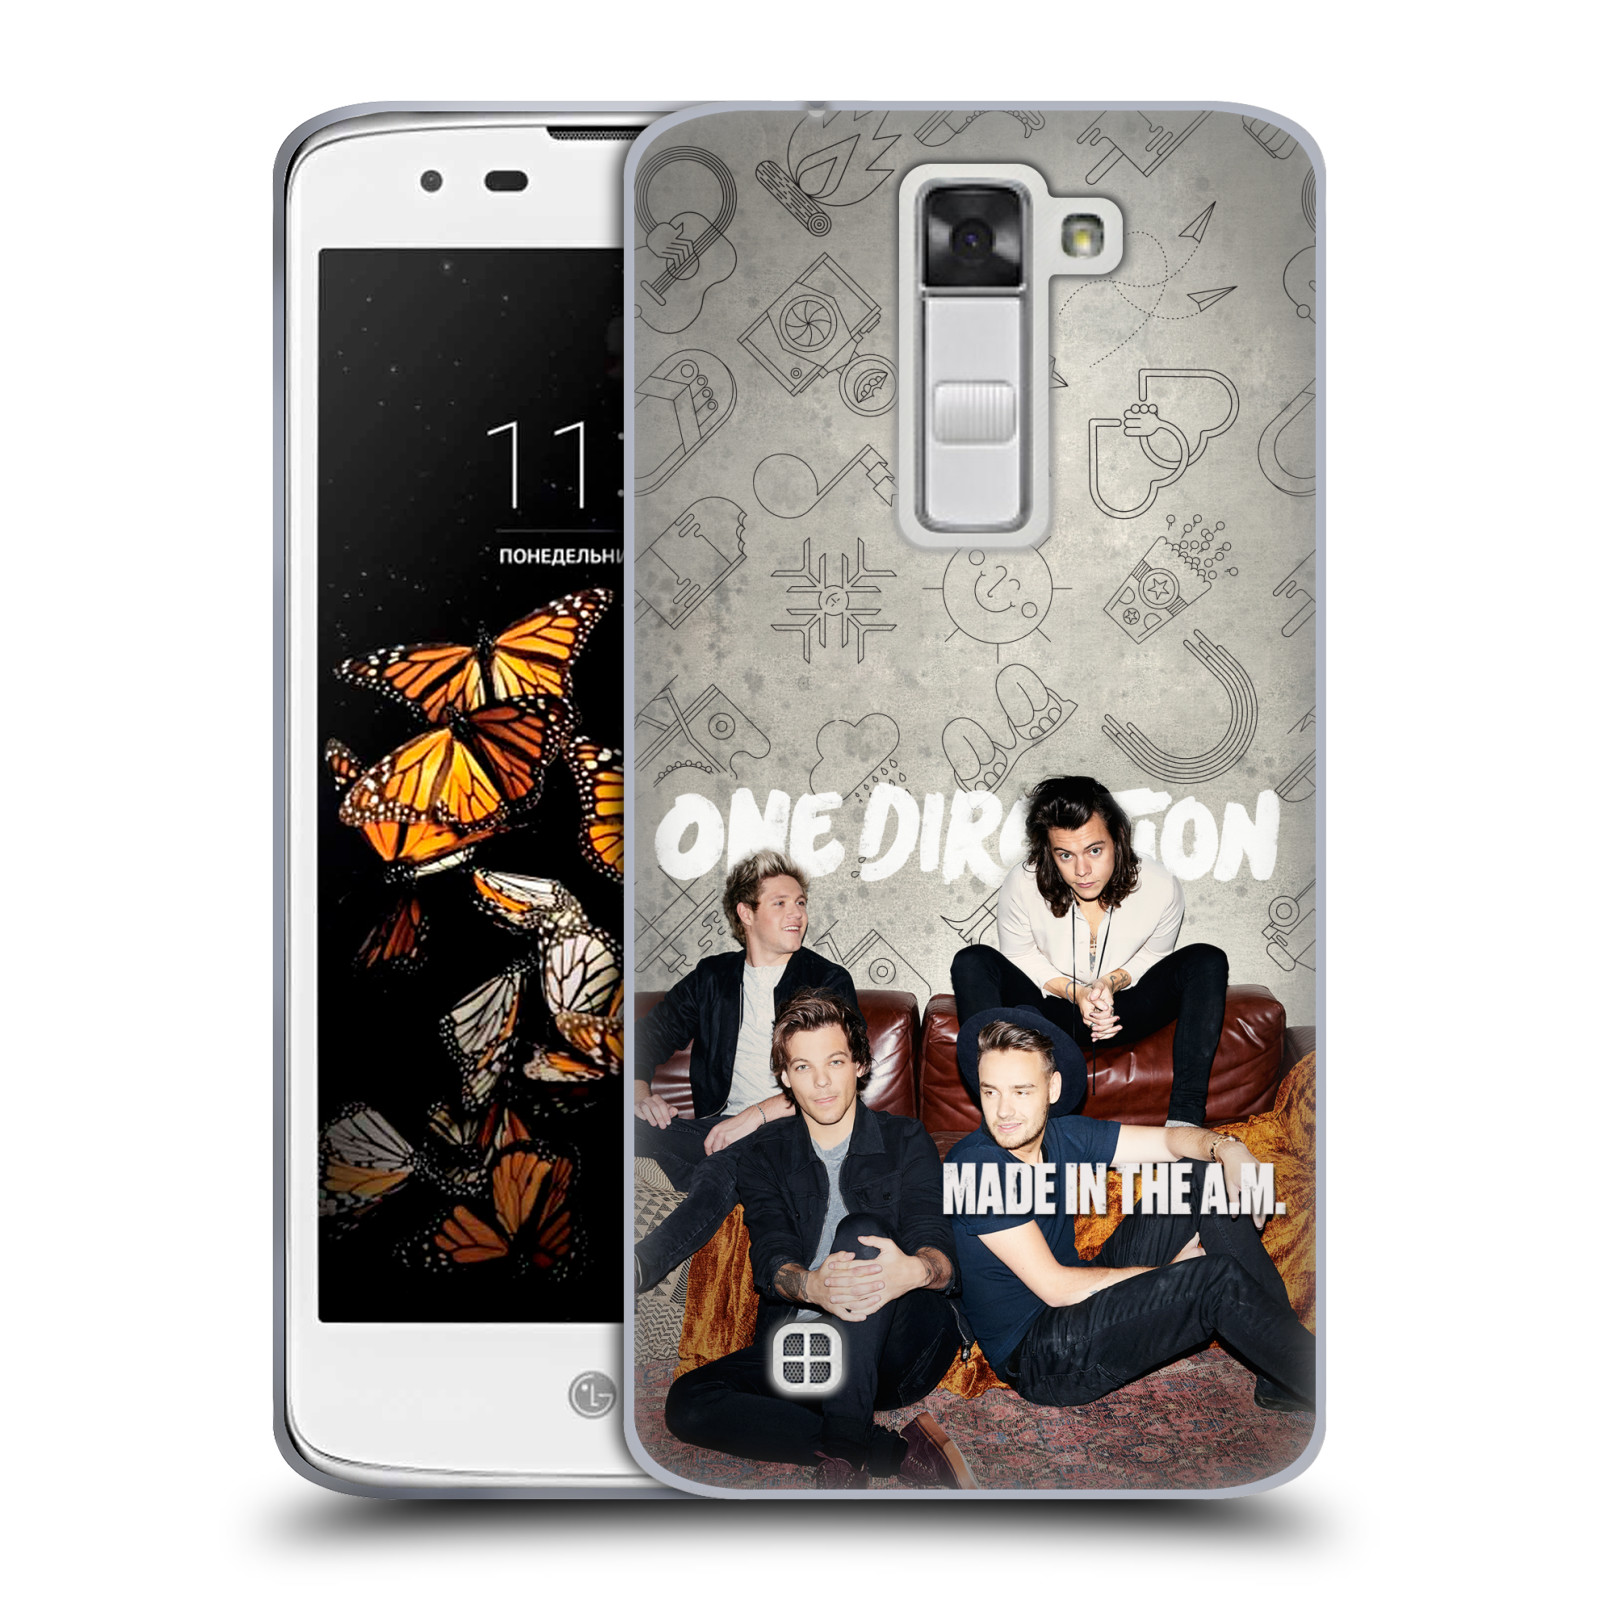 HEAD CASE silikonový obal na mobil LG K8 chlapecká skupina One Direction gauč